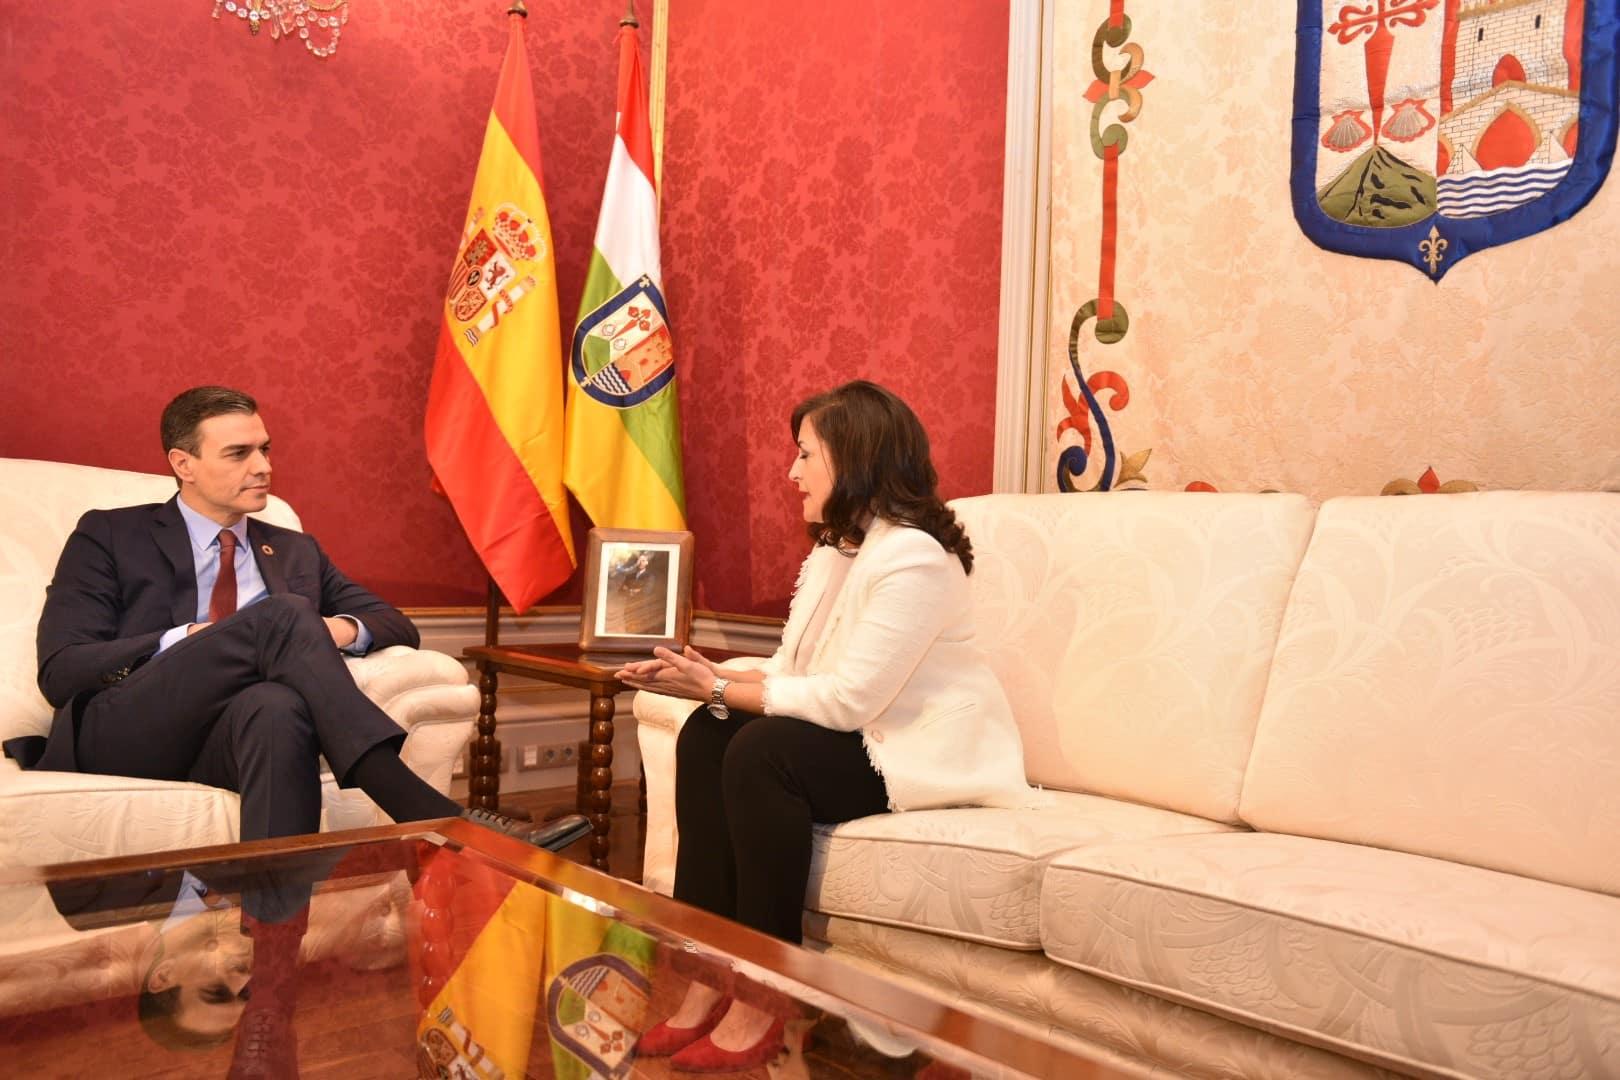 Andreu y Sánchez firman un acuerdo para convertir a La Rioja en capital digital del español 2